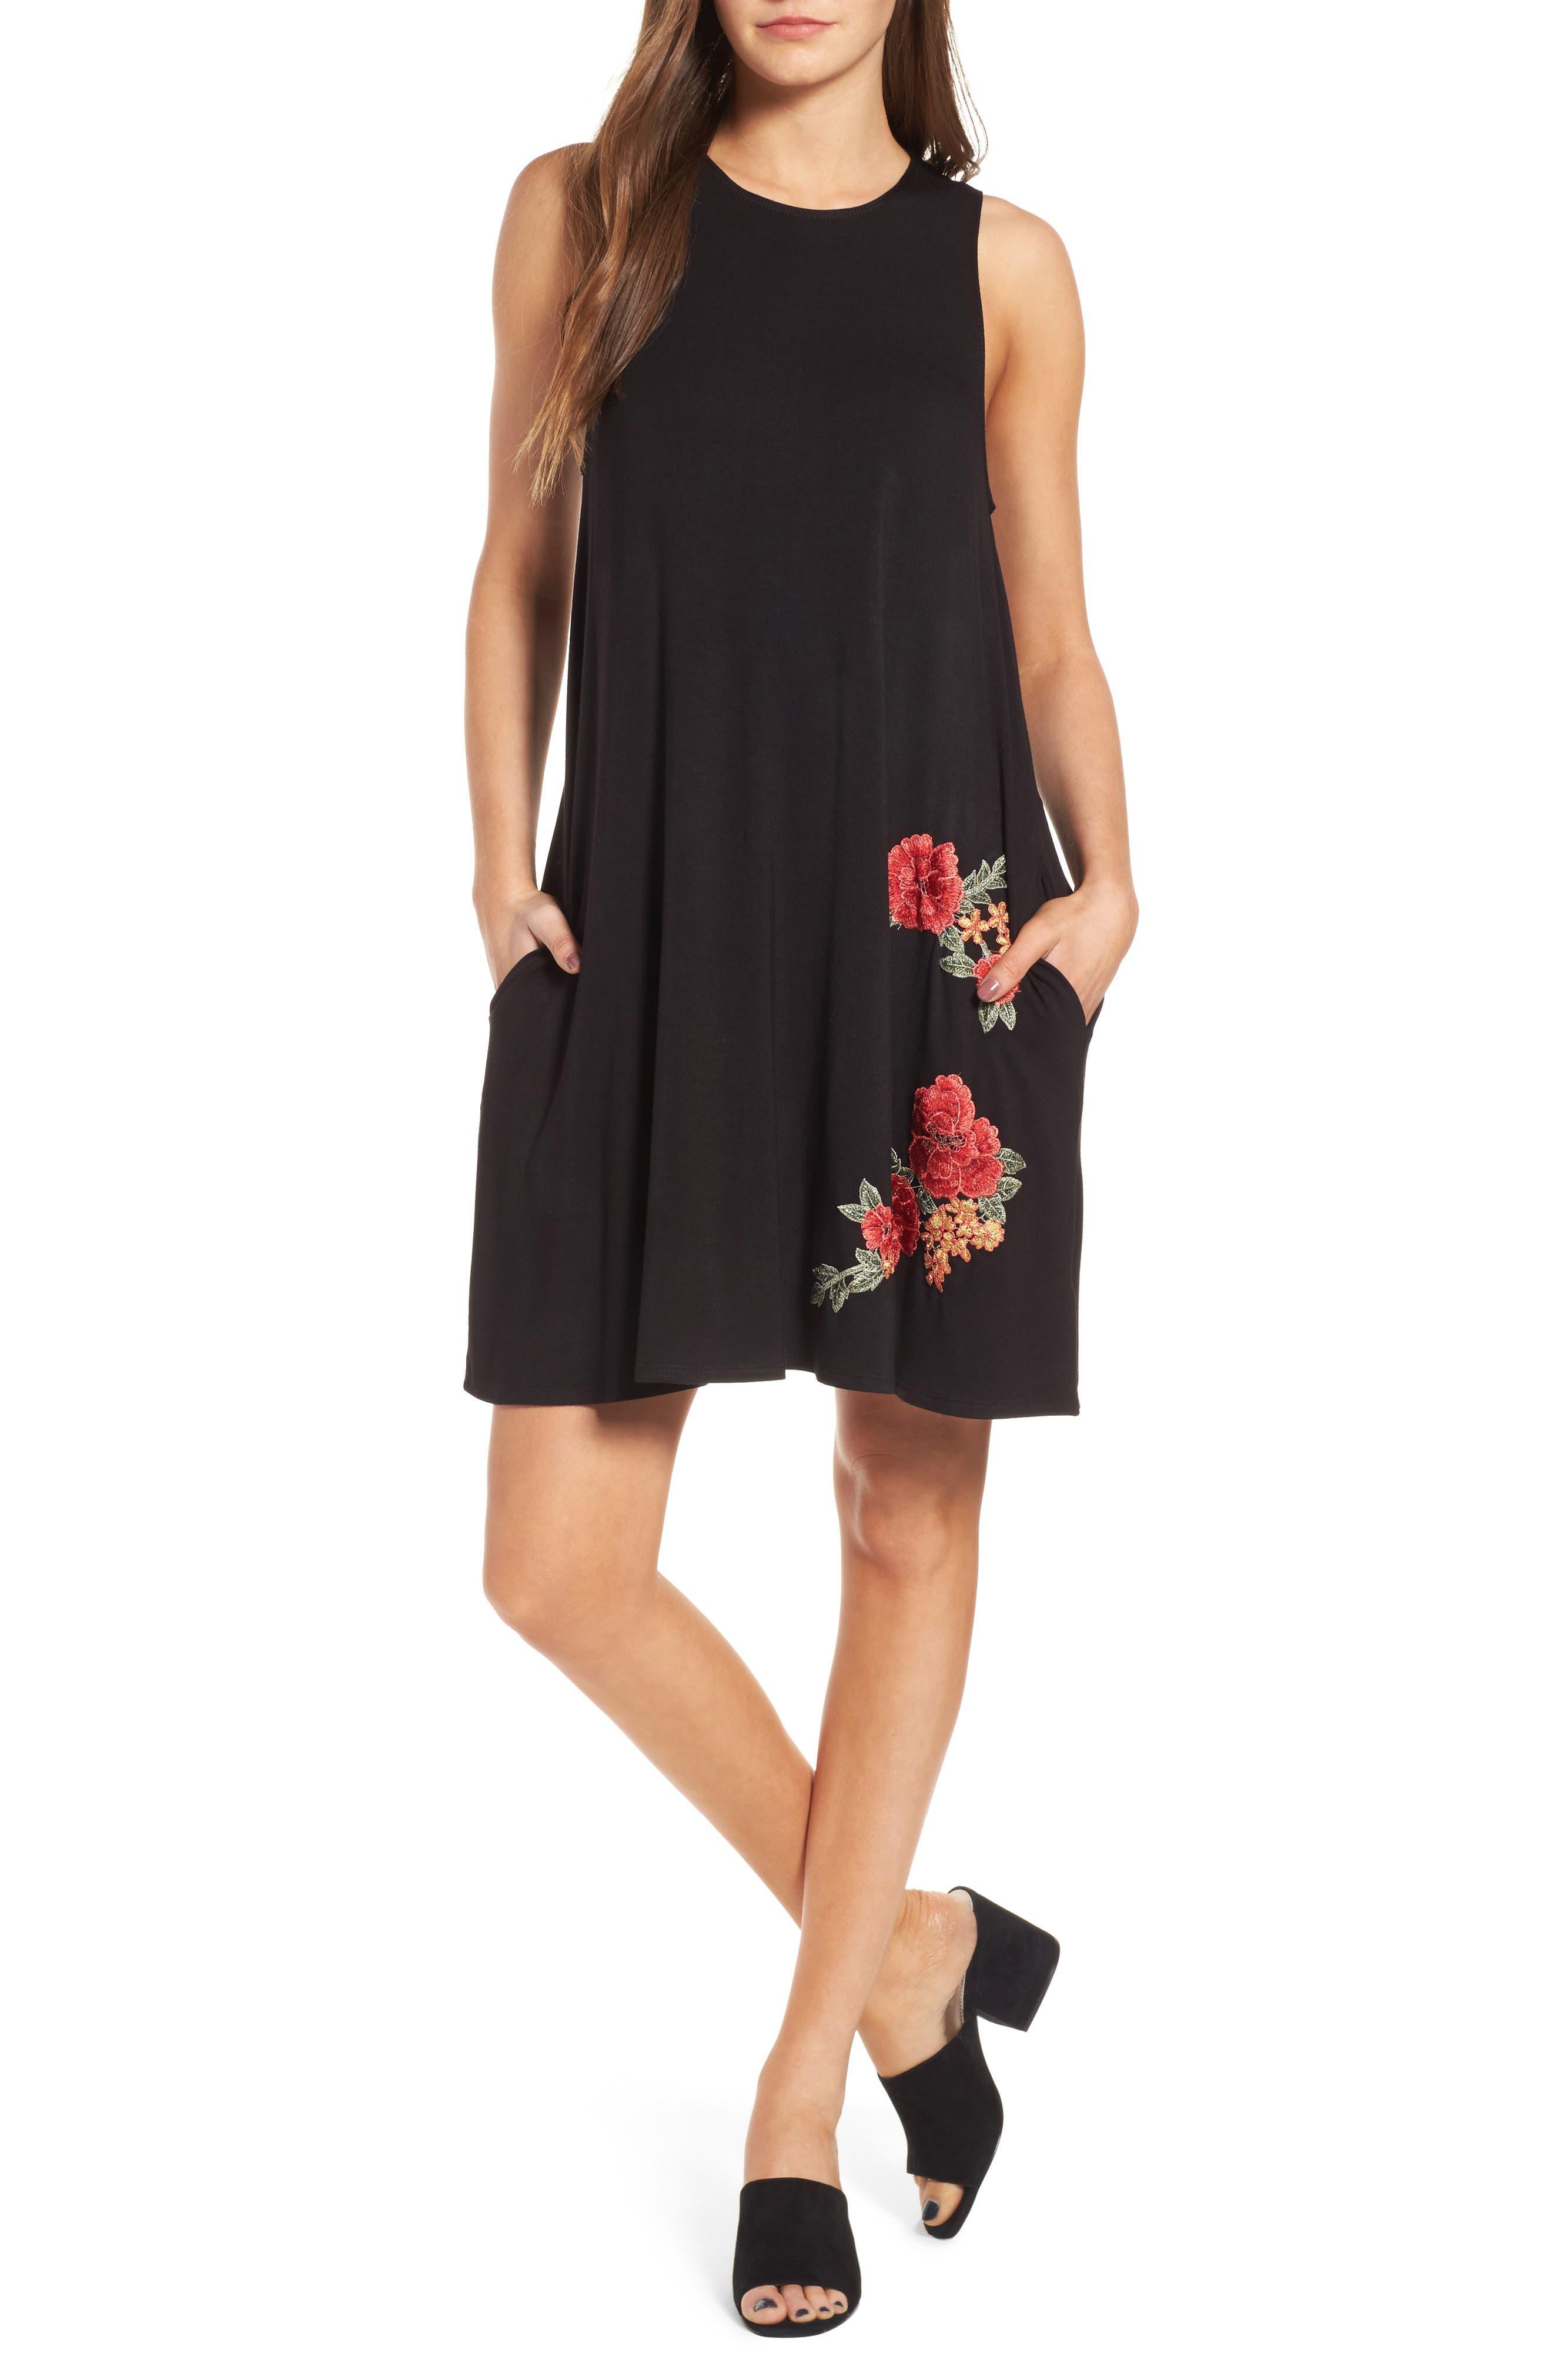 Alternate Image 1 Selected - Socialite Floral Appliqué Tank Dress